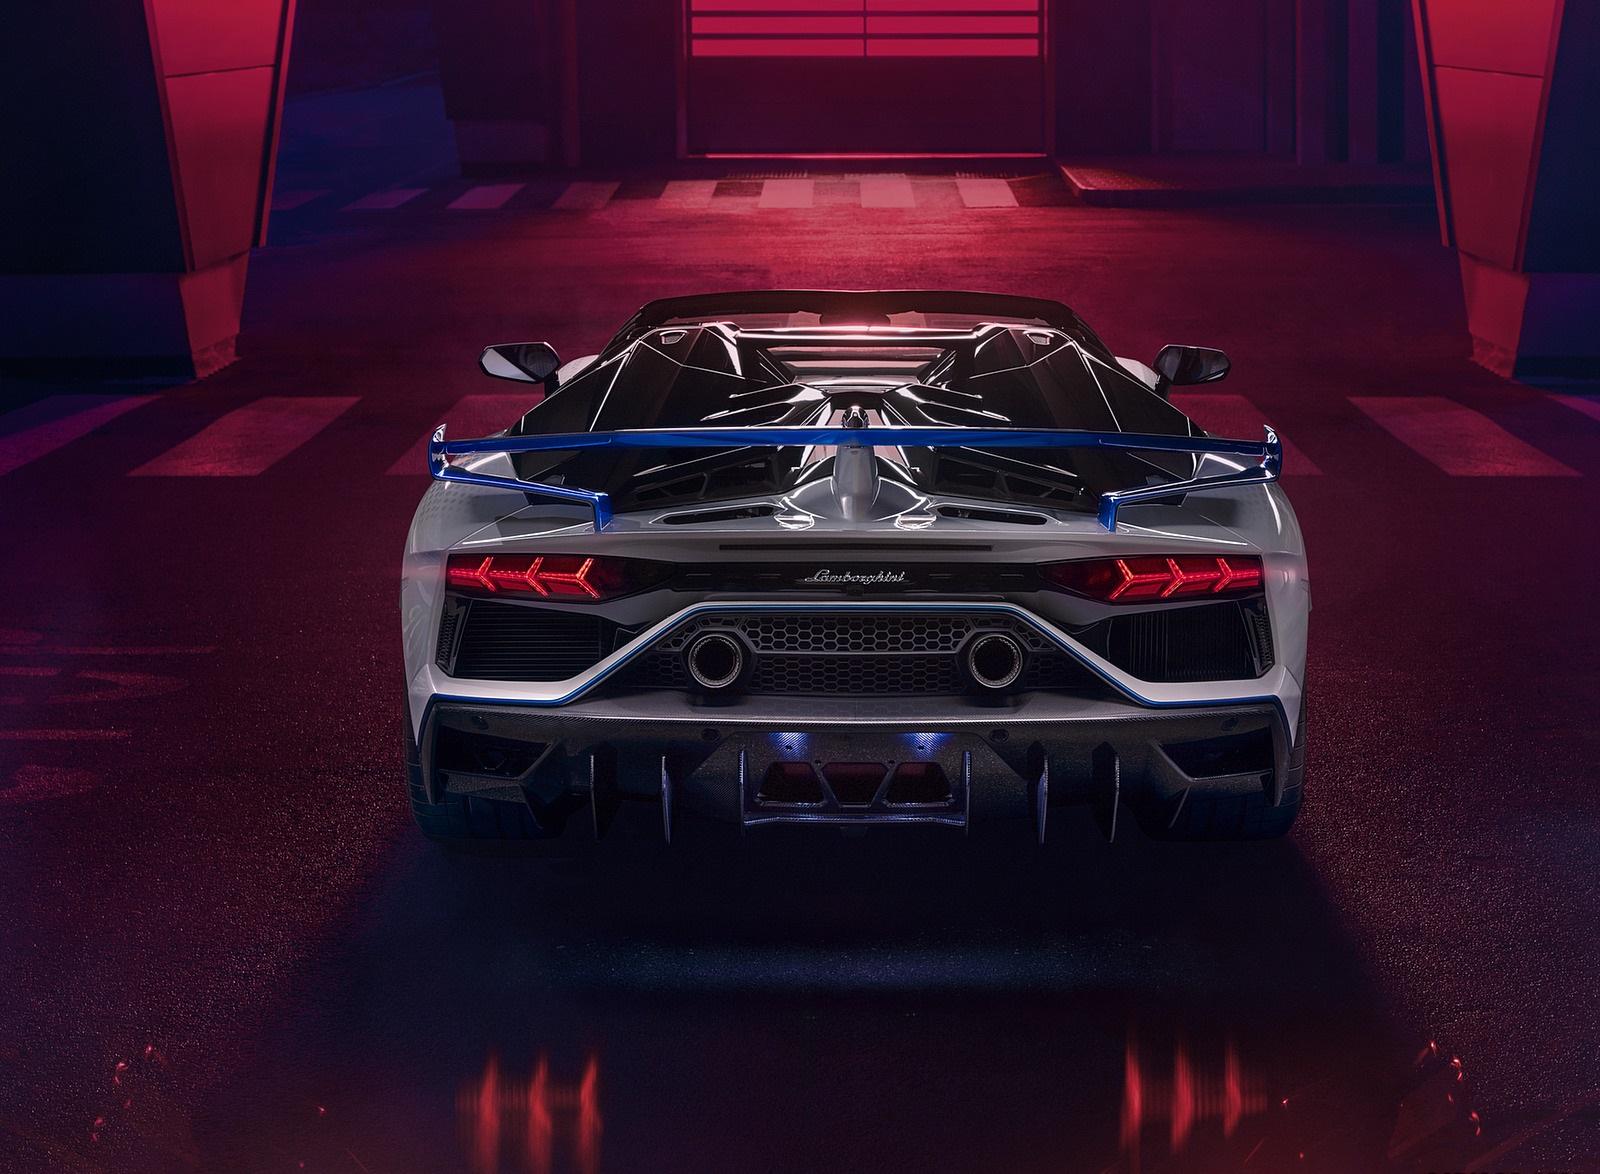 2020 Lamborghini Aventador SVJ Xago Edition Rear Wallpapers (5)